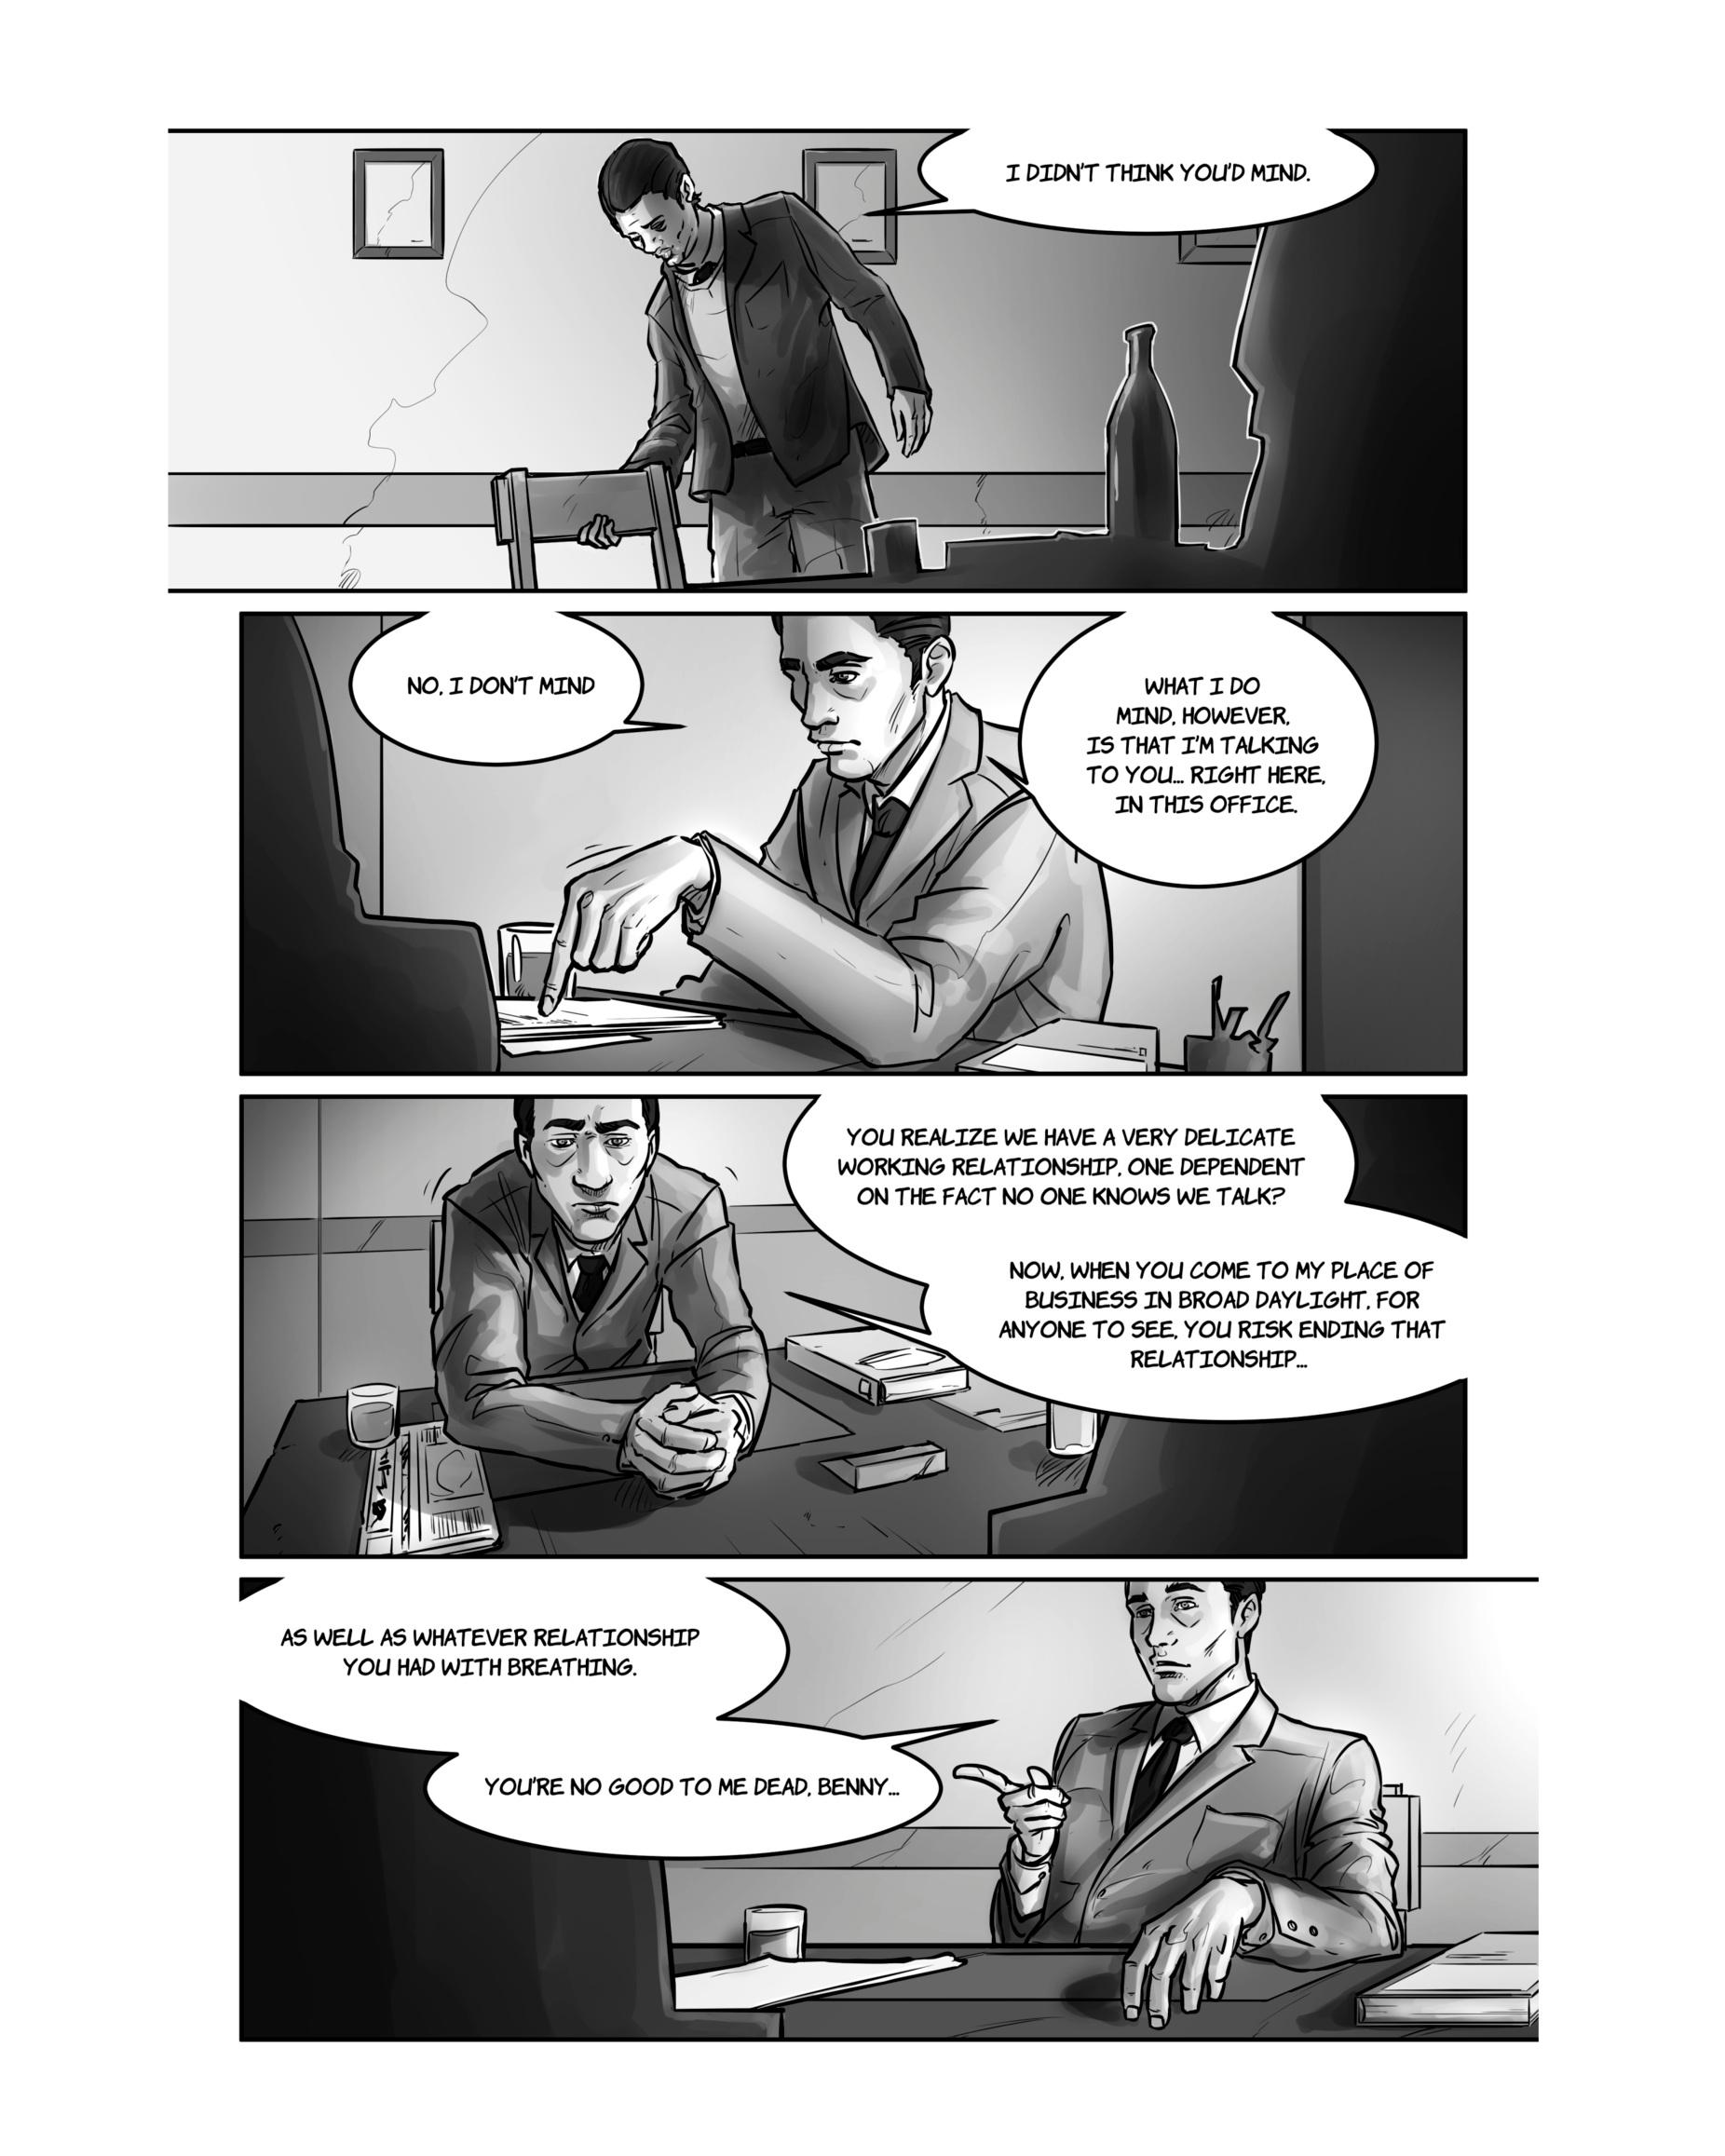 owatw_1+PAGE+13+WEB.jpg